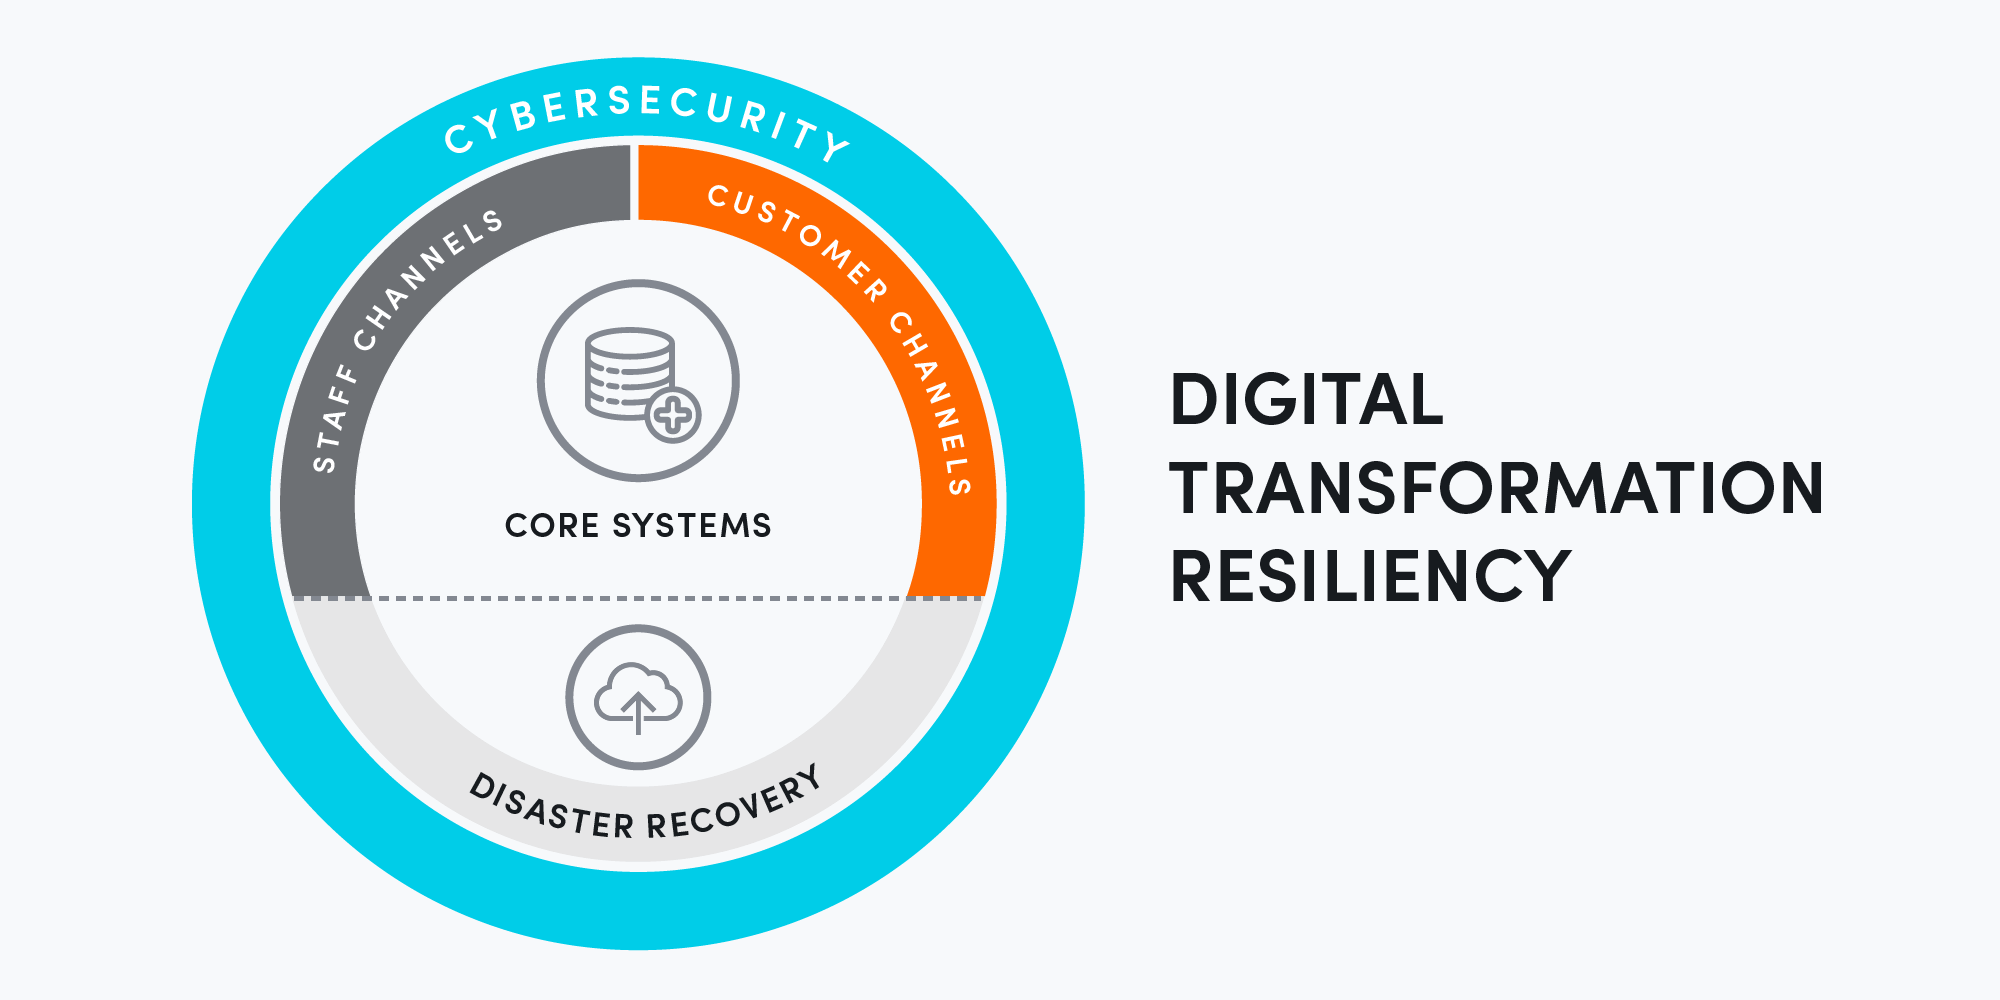 Digital transformation resiliency